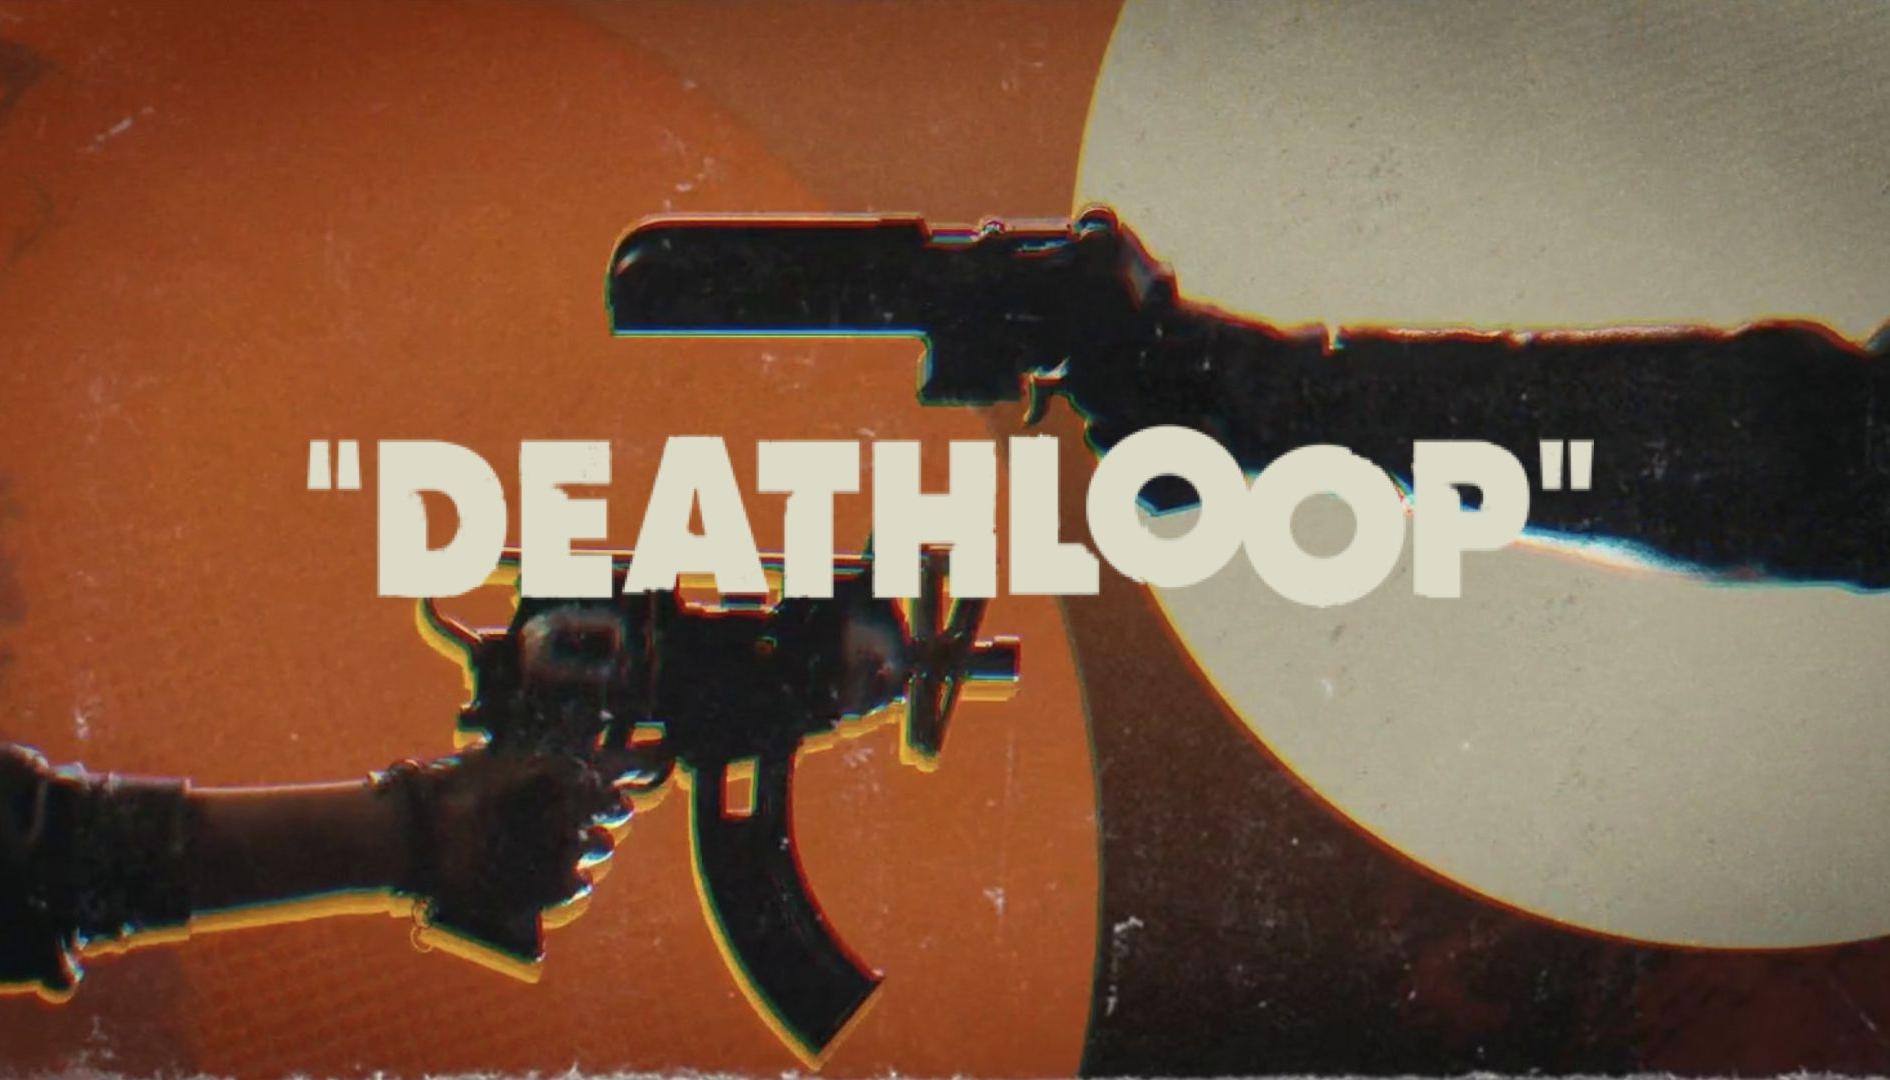 Deathloop: l'esclusiva PS5 è stata rinviata